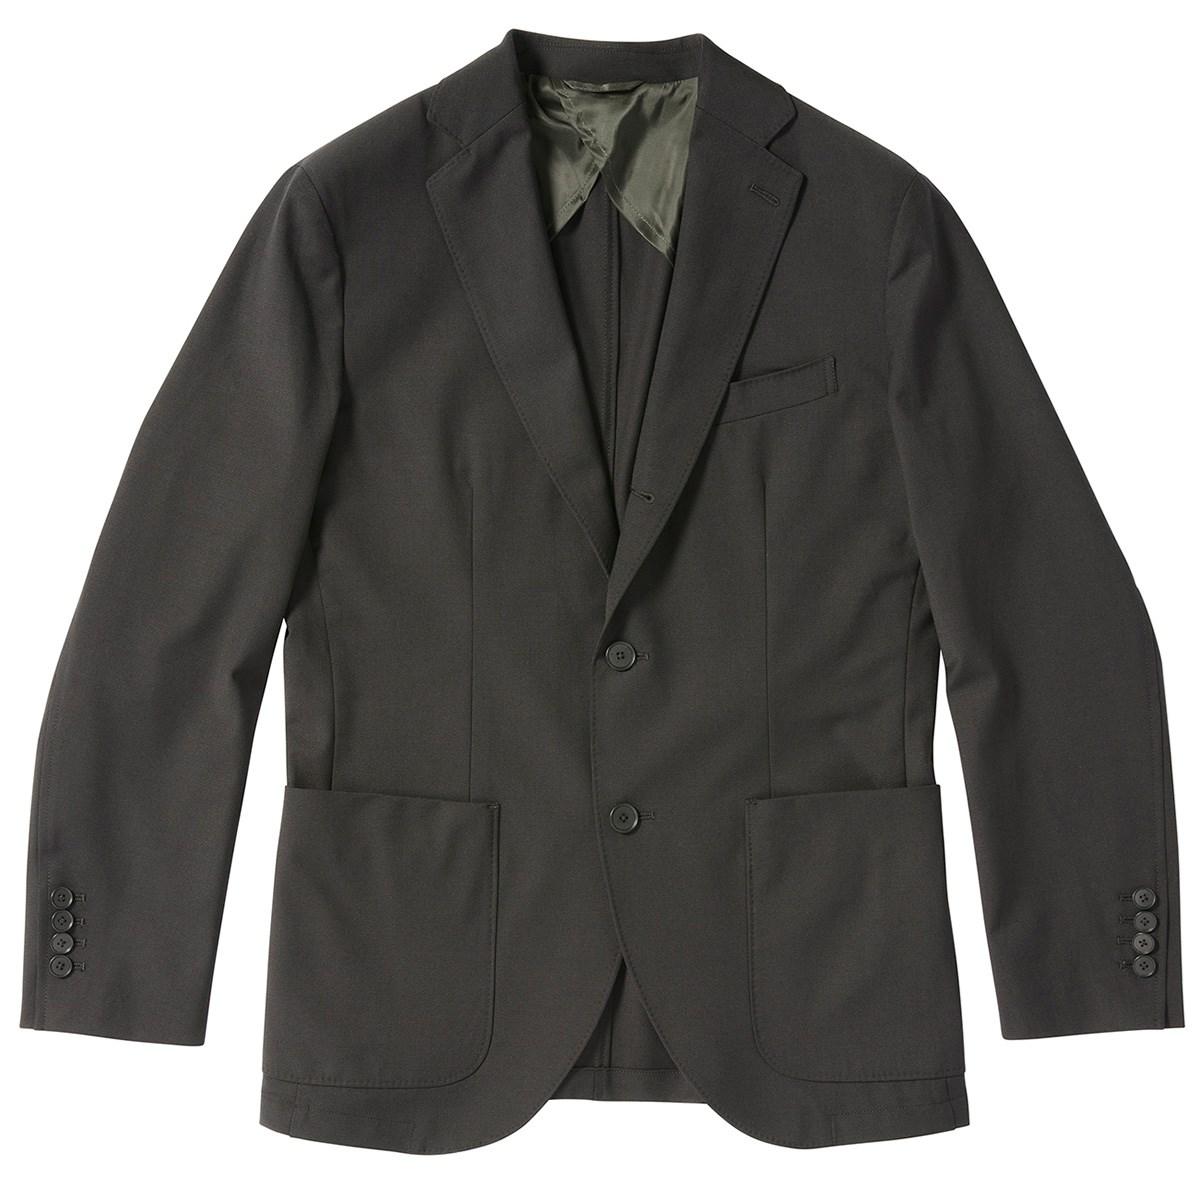 GDO オリジナル 2WAYストレッチジャケット